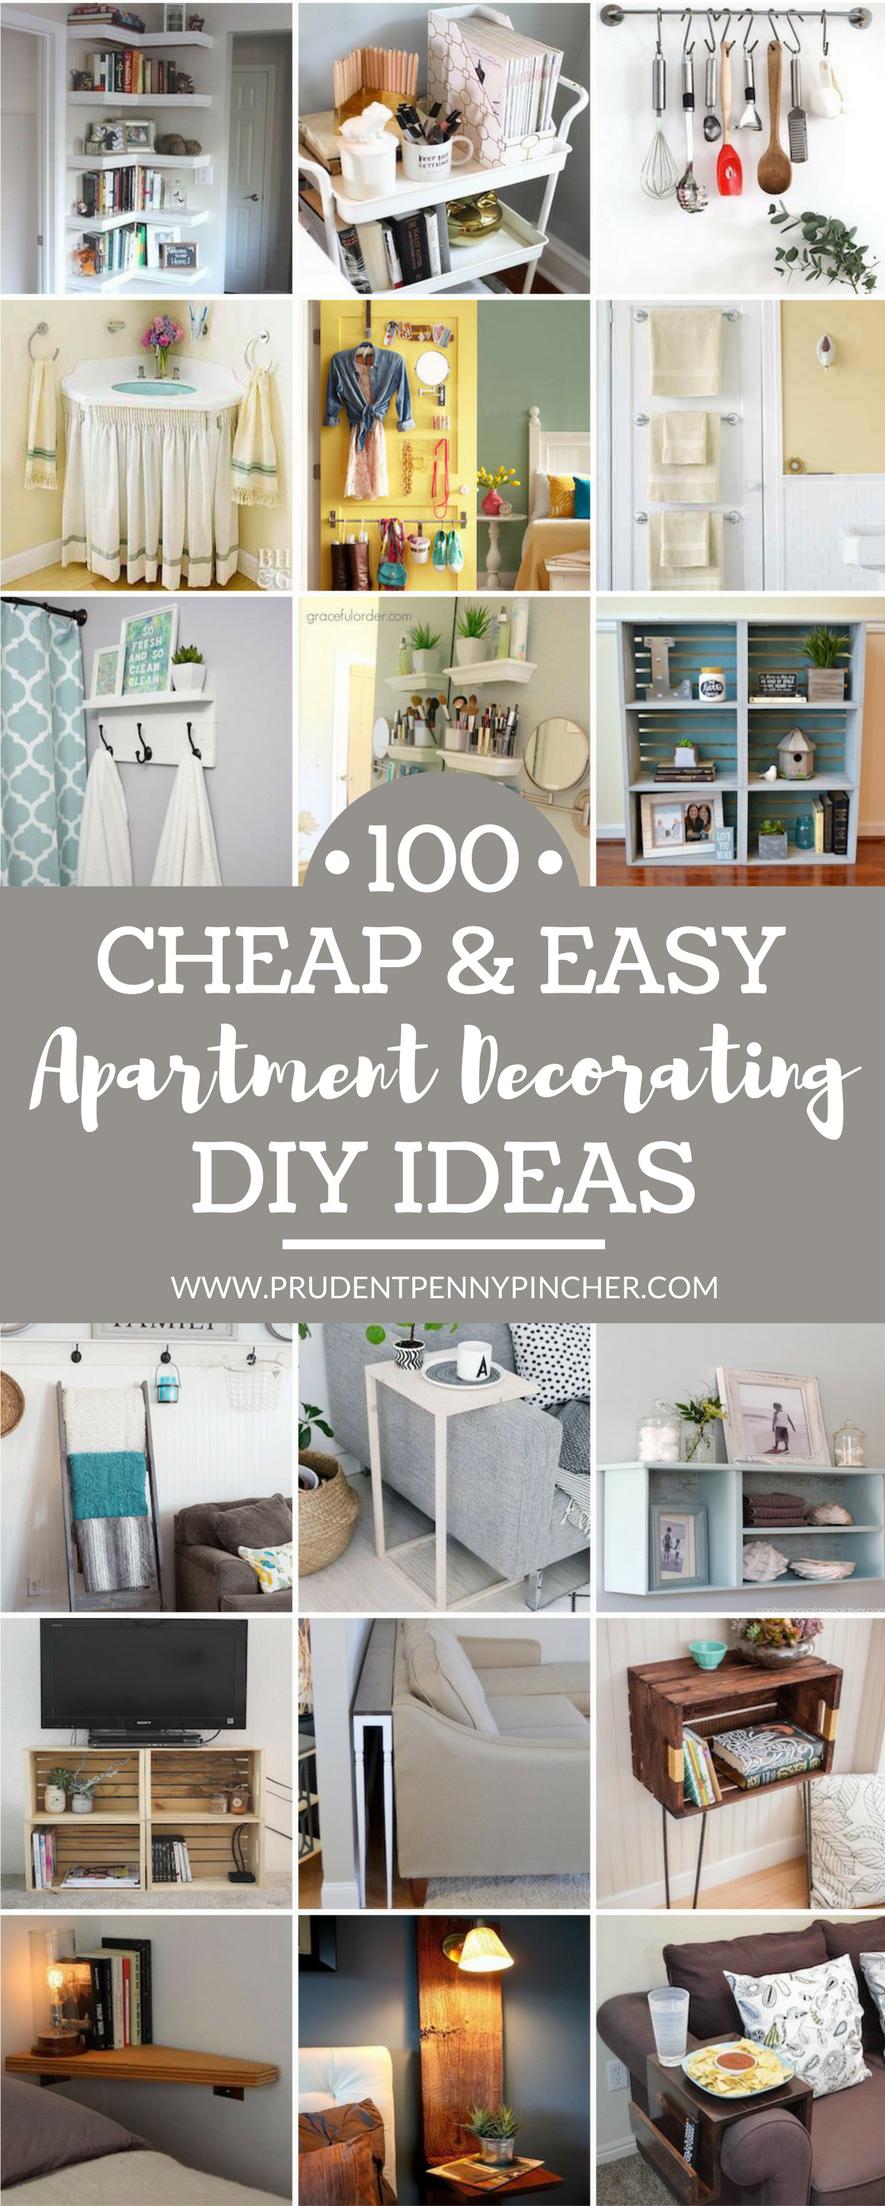 100 cheap and easy diy apartment decorating ideas diy on diy home decor on a budget apartment ideas id=33858